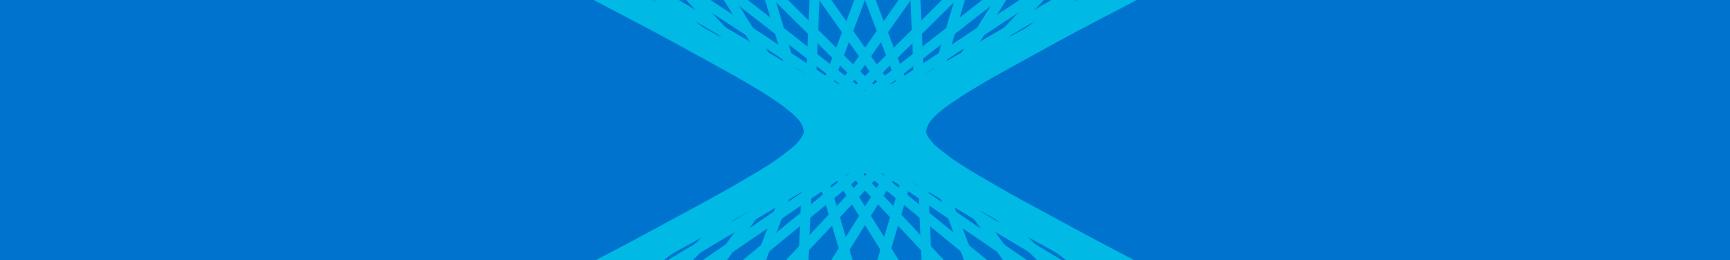 Banner decorative image